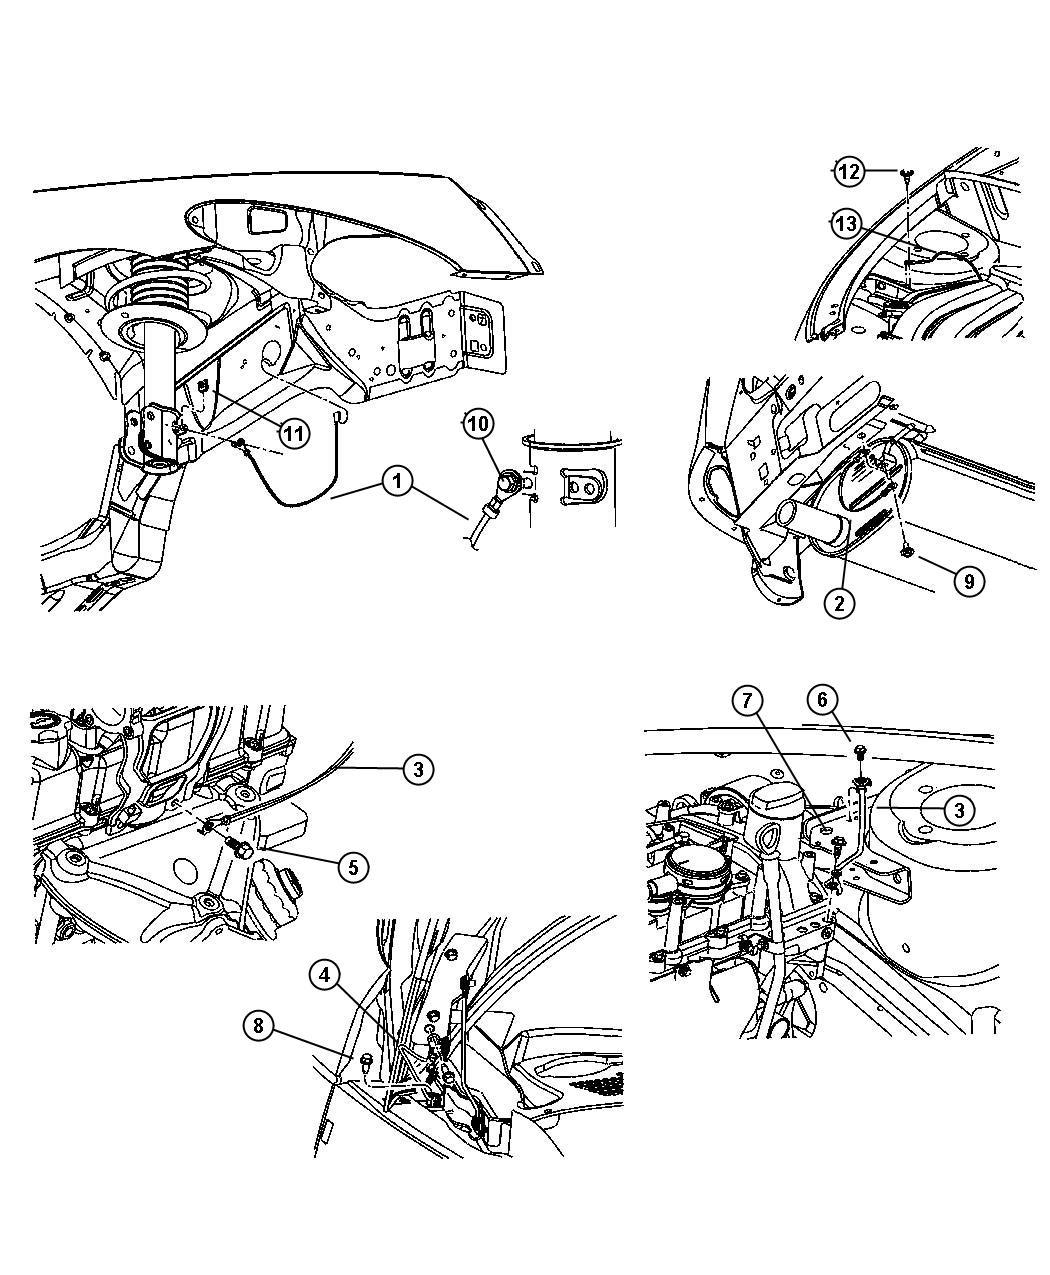 diagram for 1997 jaguar xk8 engine